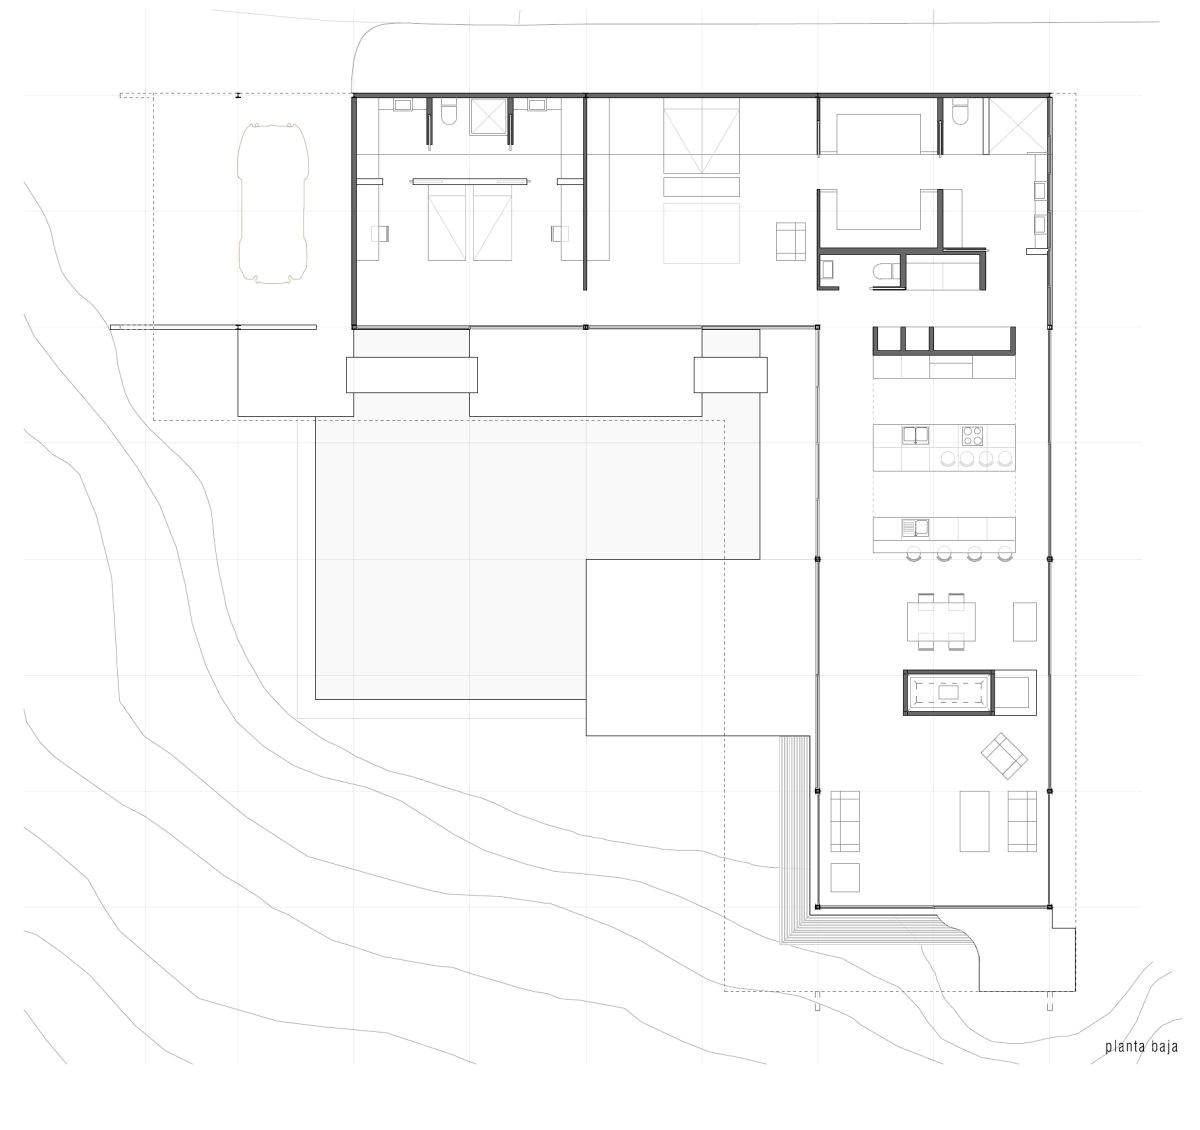 stahl house plan